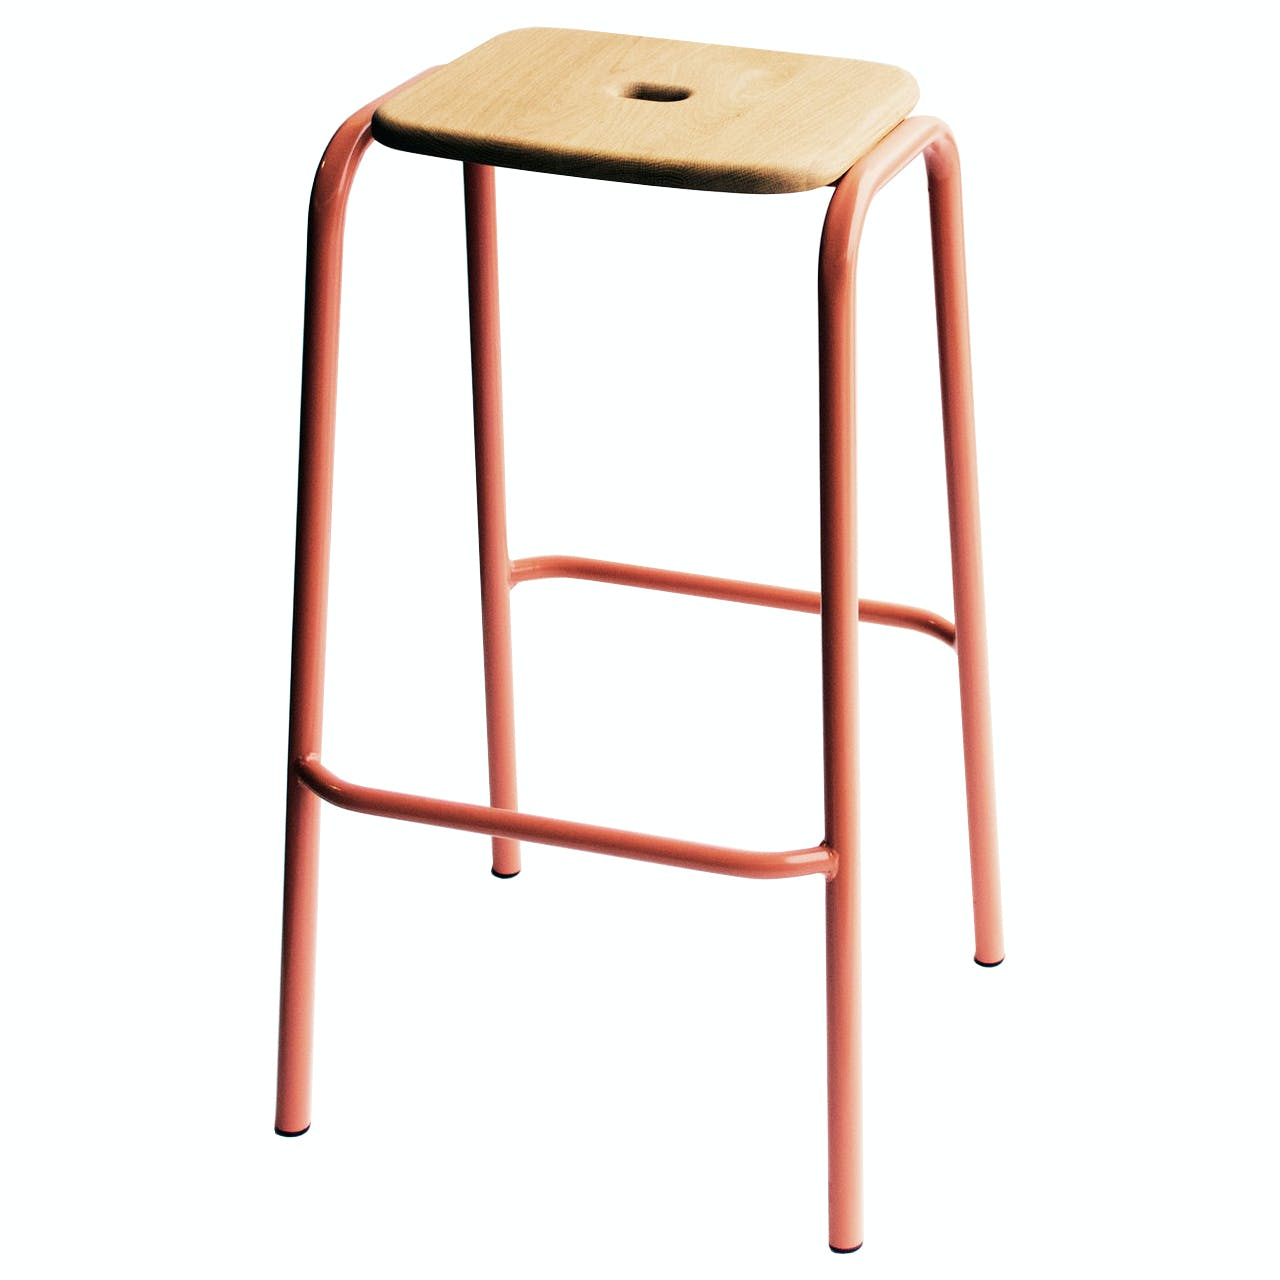 Division-12-a-frame-bar-stool-haute-living-thumbnail